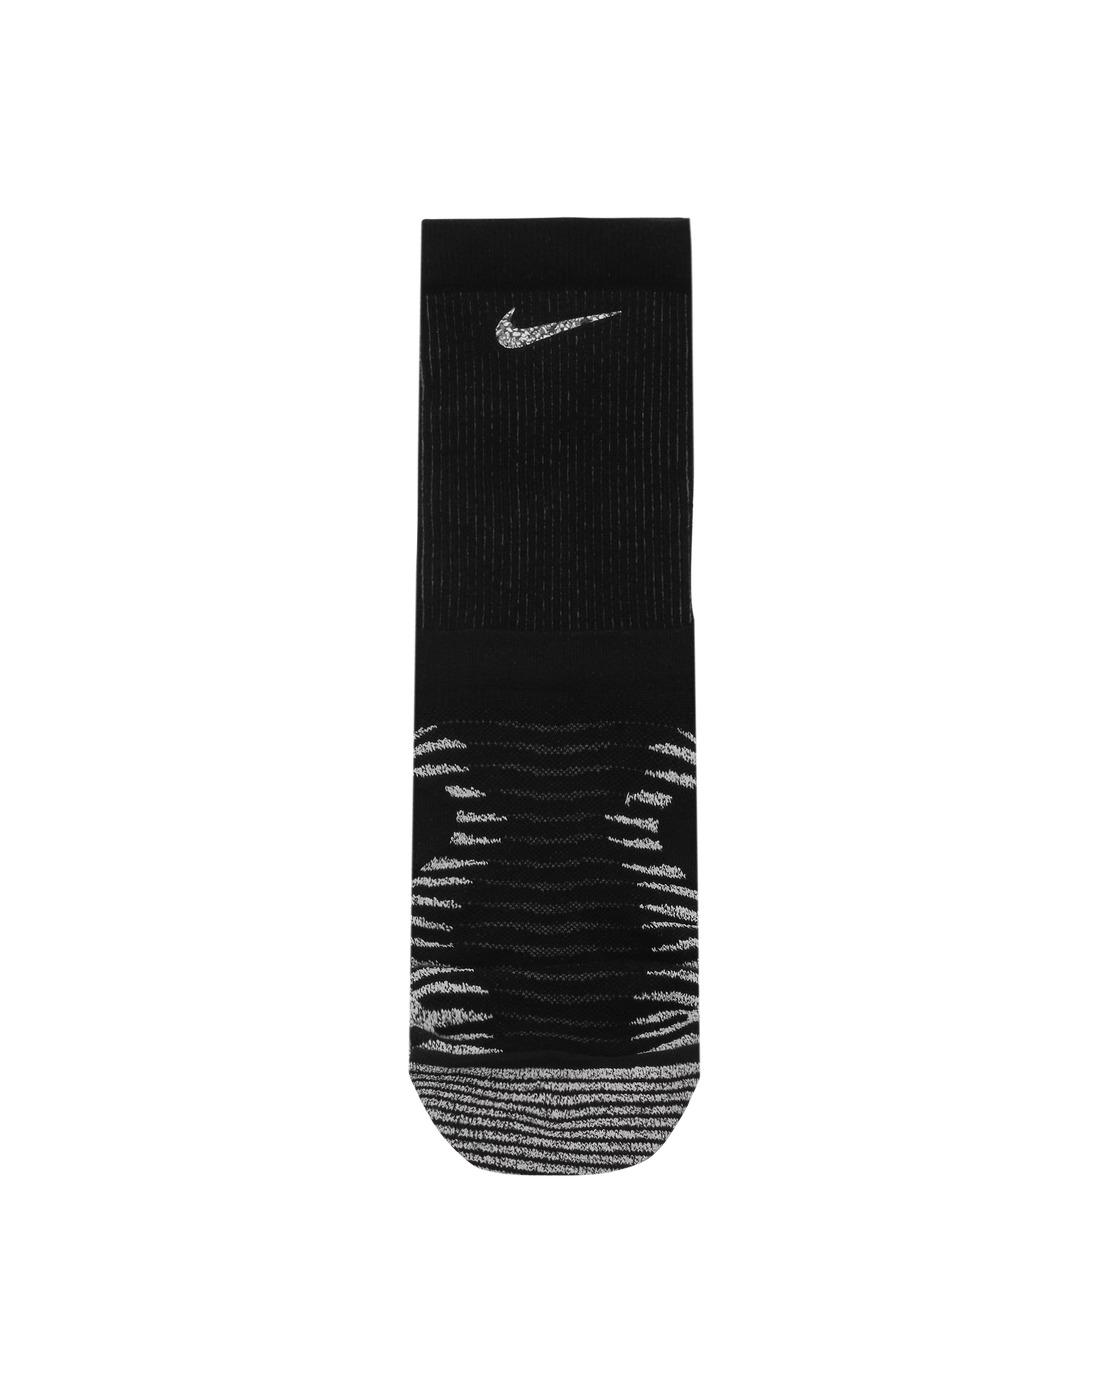 Photo: Nike Trail Running Crew Socks Black/Anthracite